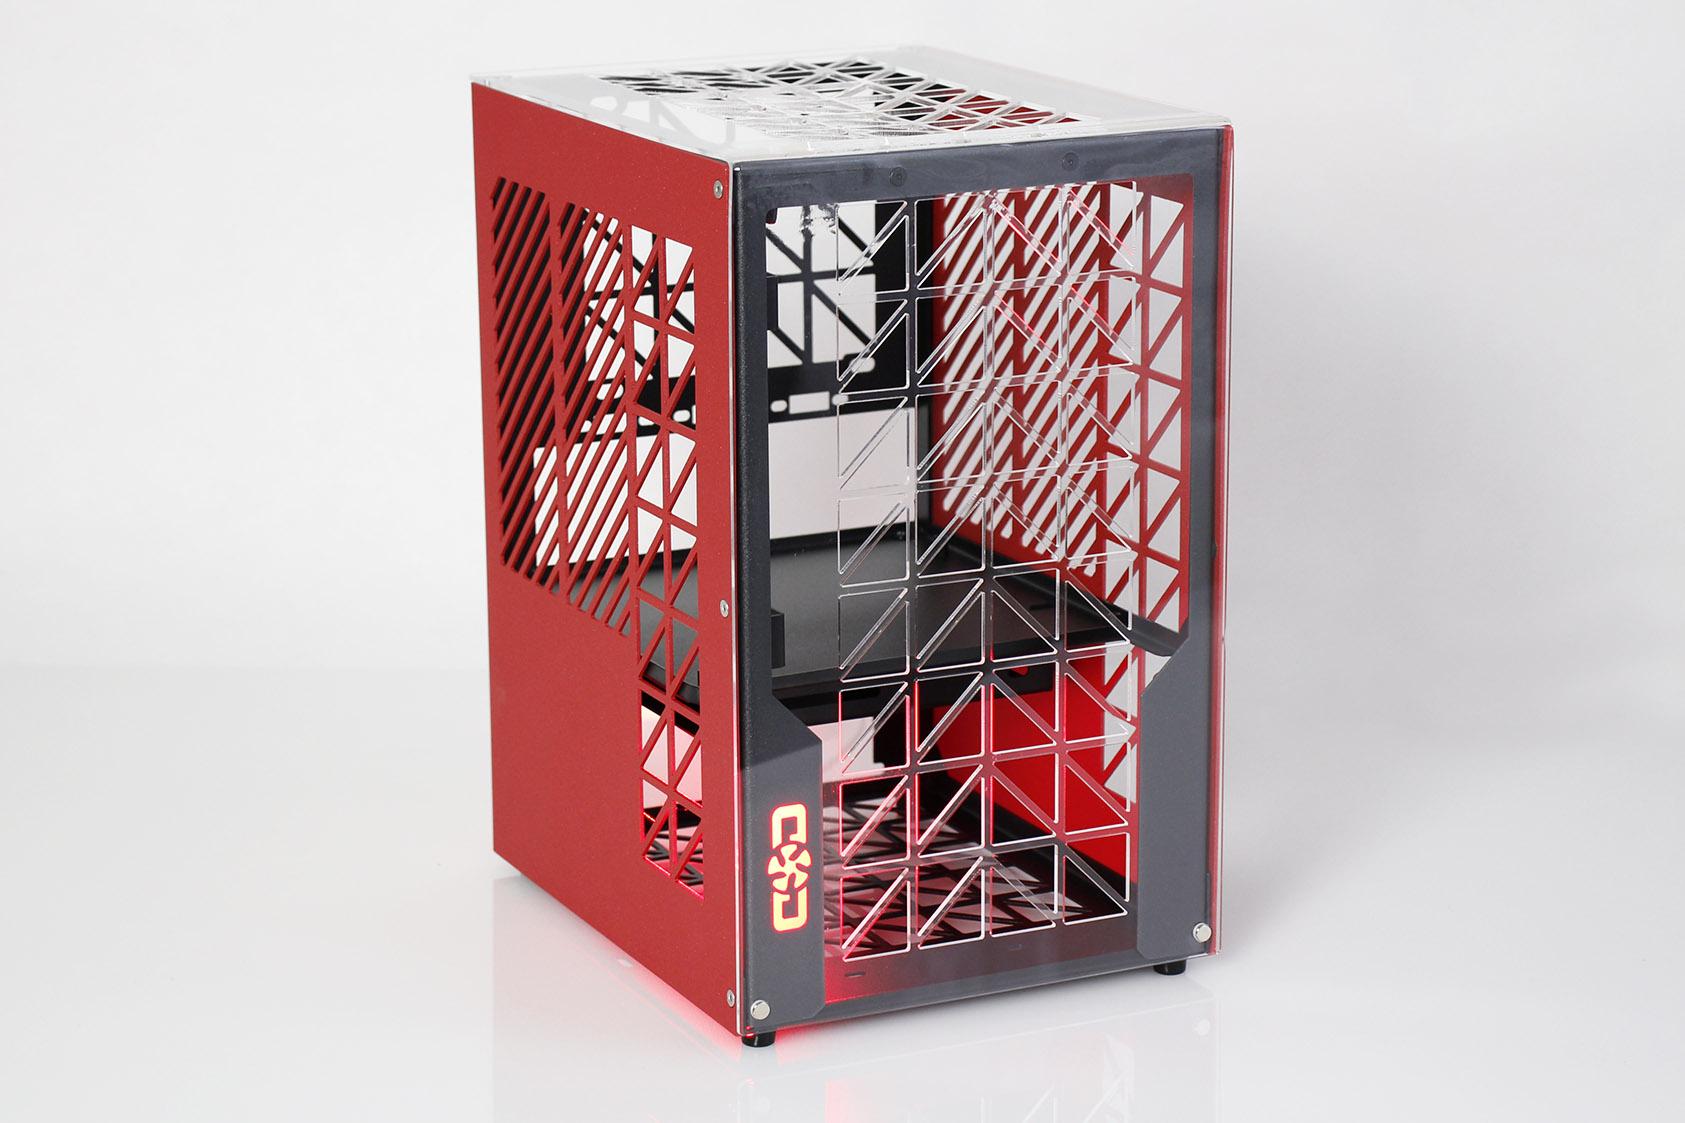 R-Cube 12.7L prototype